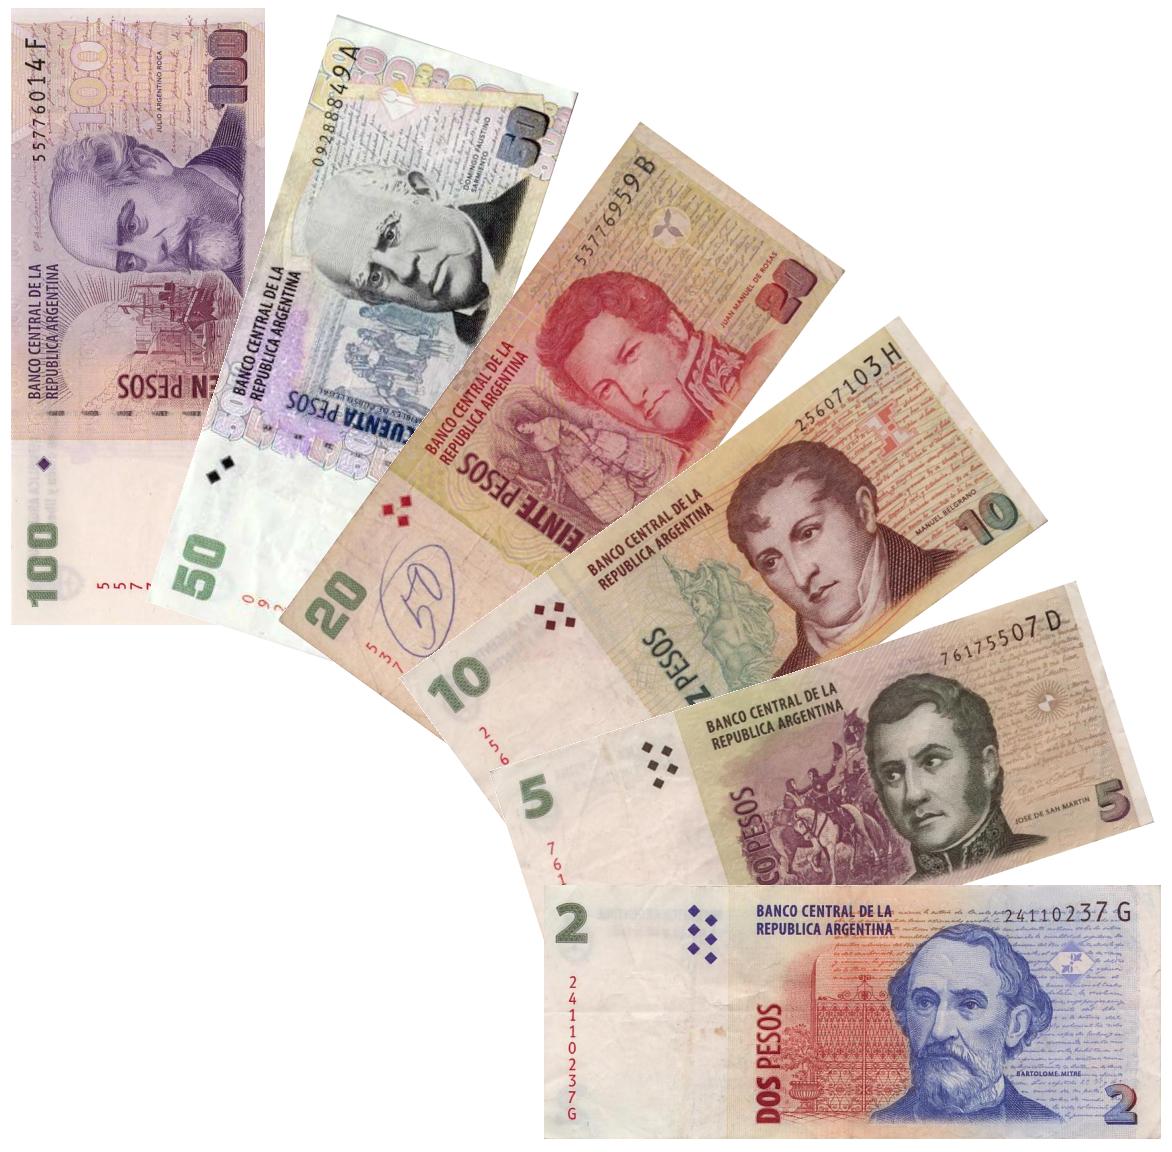 Argentina money clipart image freeuse stock PKR/ARS) Convert Pakistani rupee To Argentine peso - RTER.info image freeuse stock